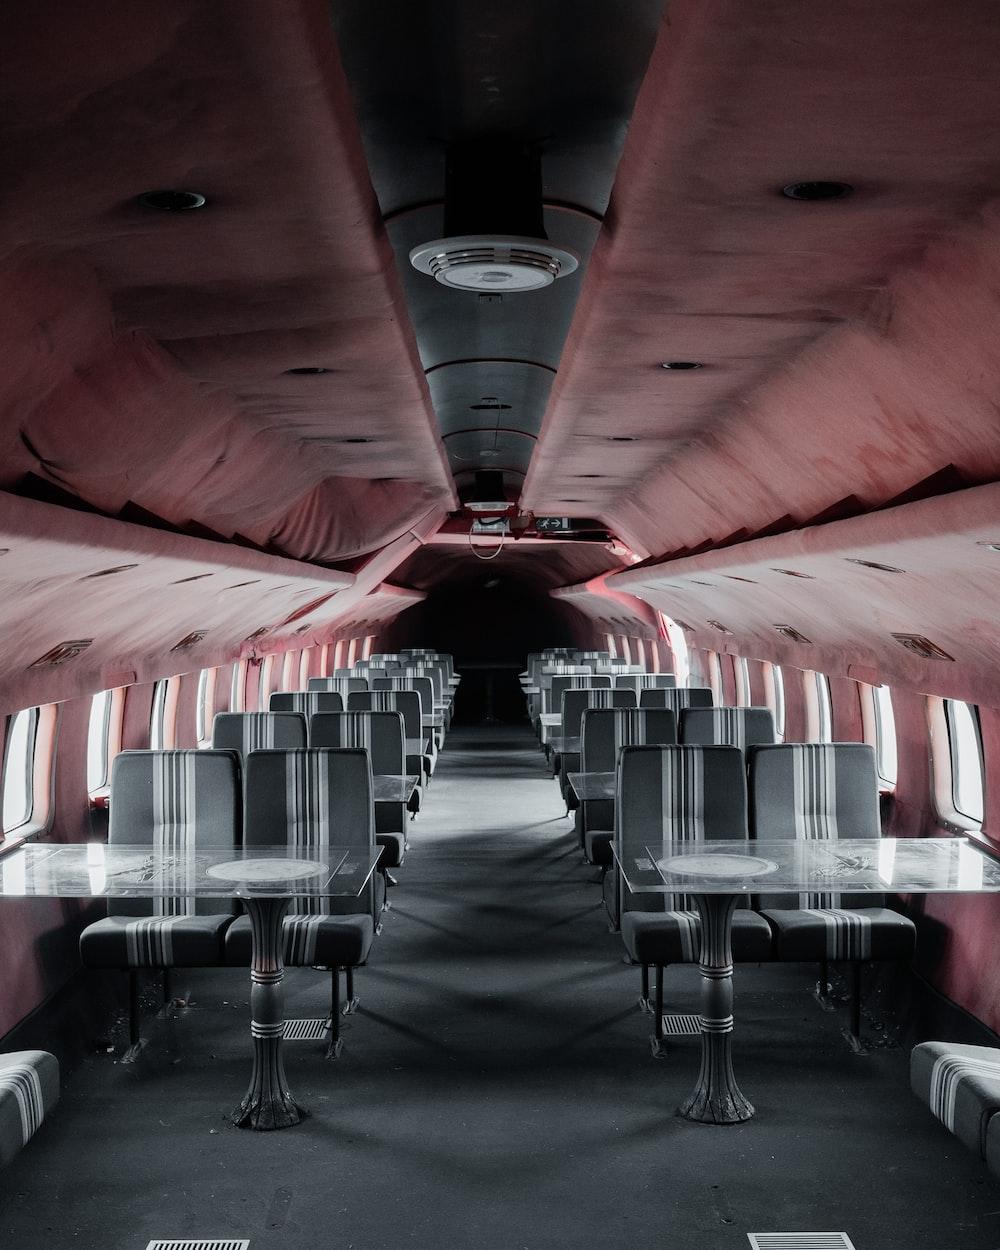 empty gray and white seats